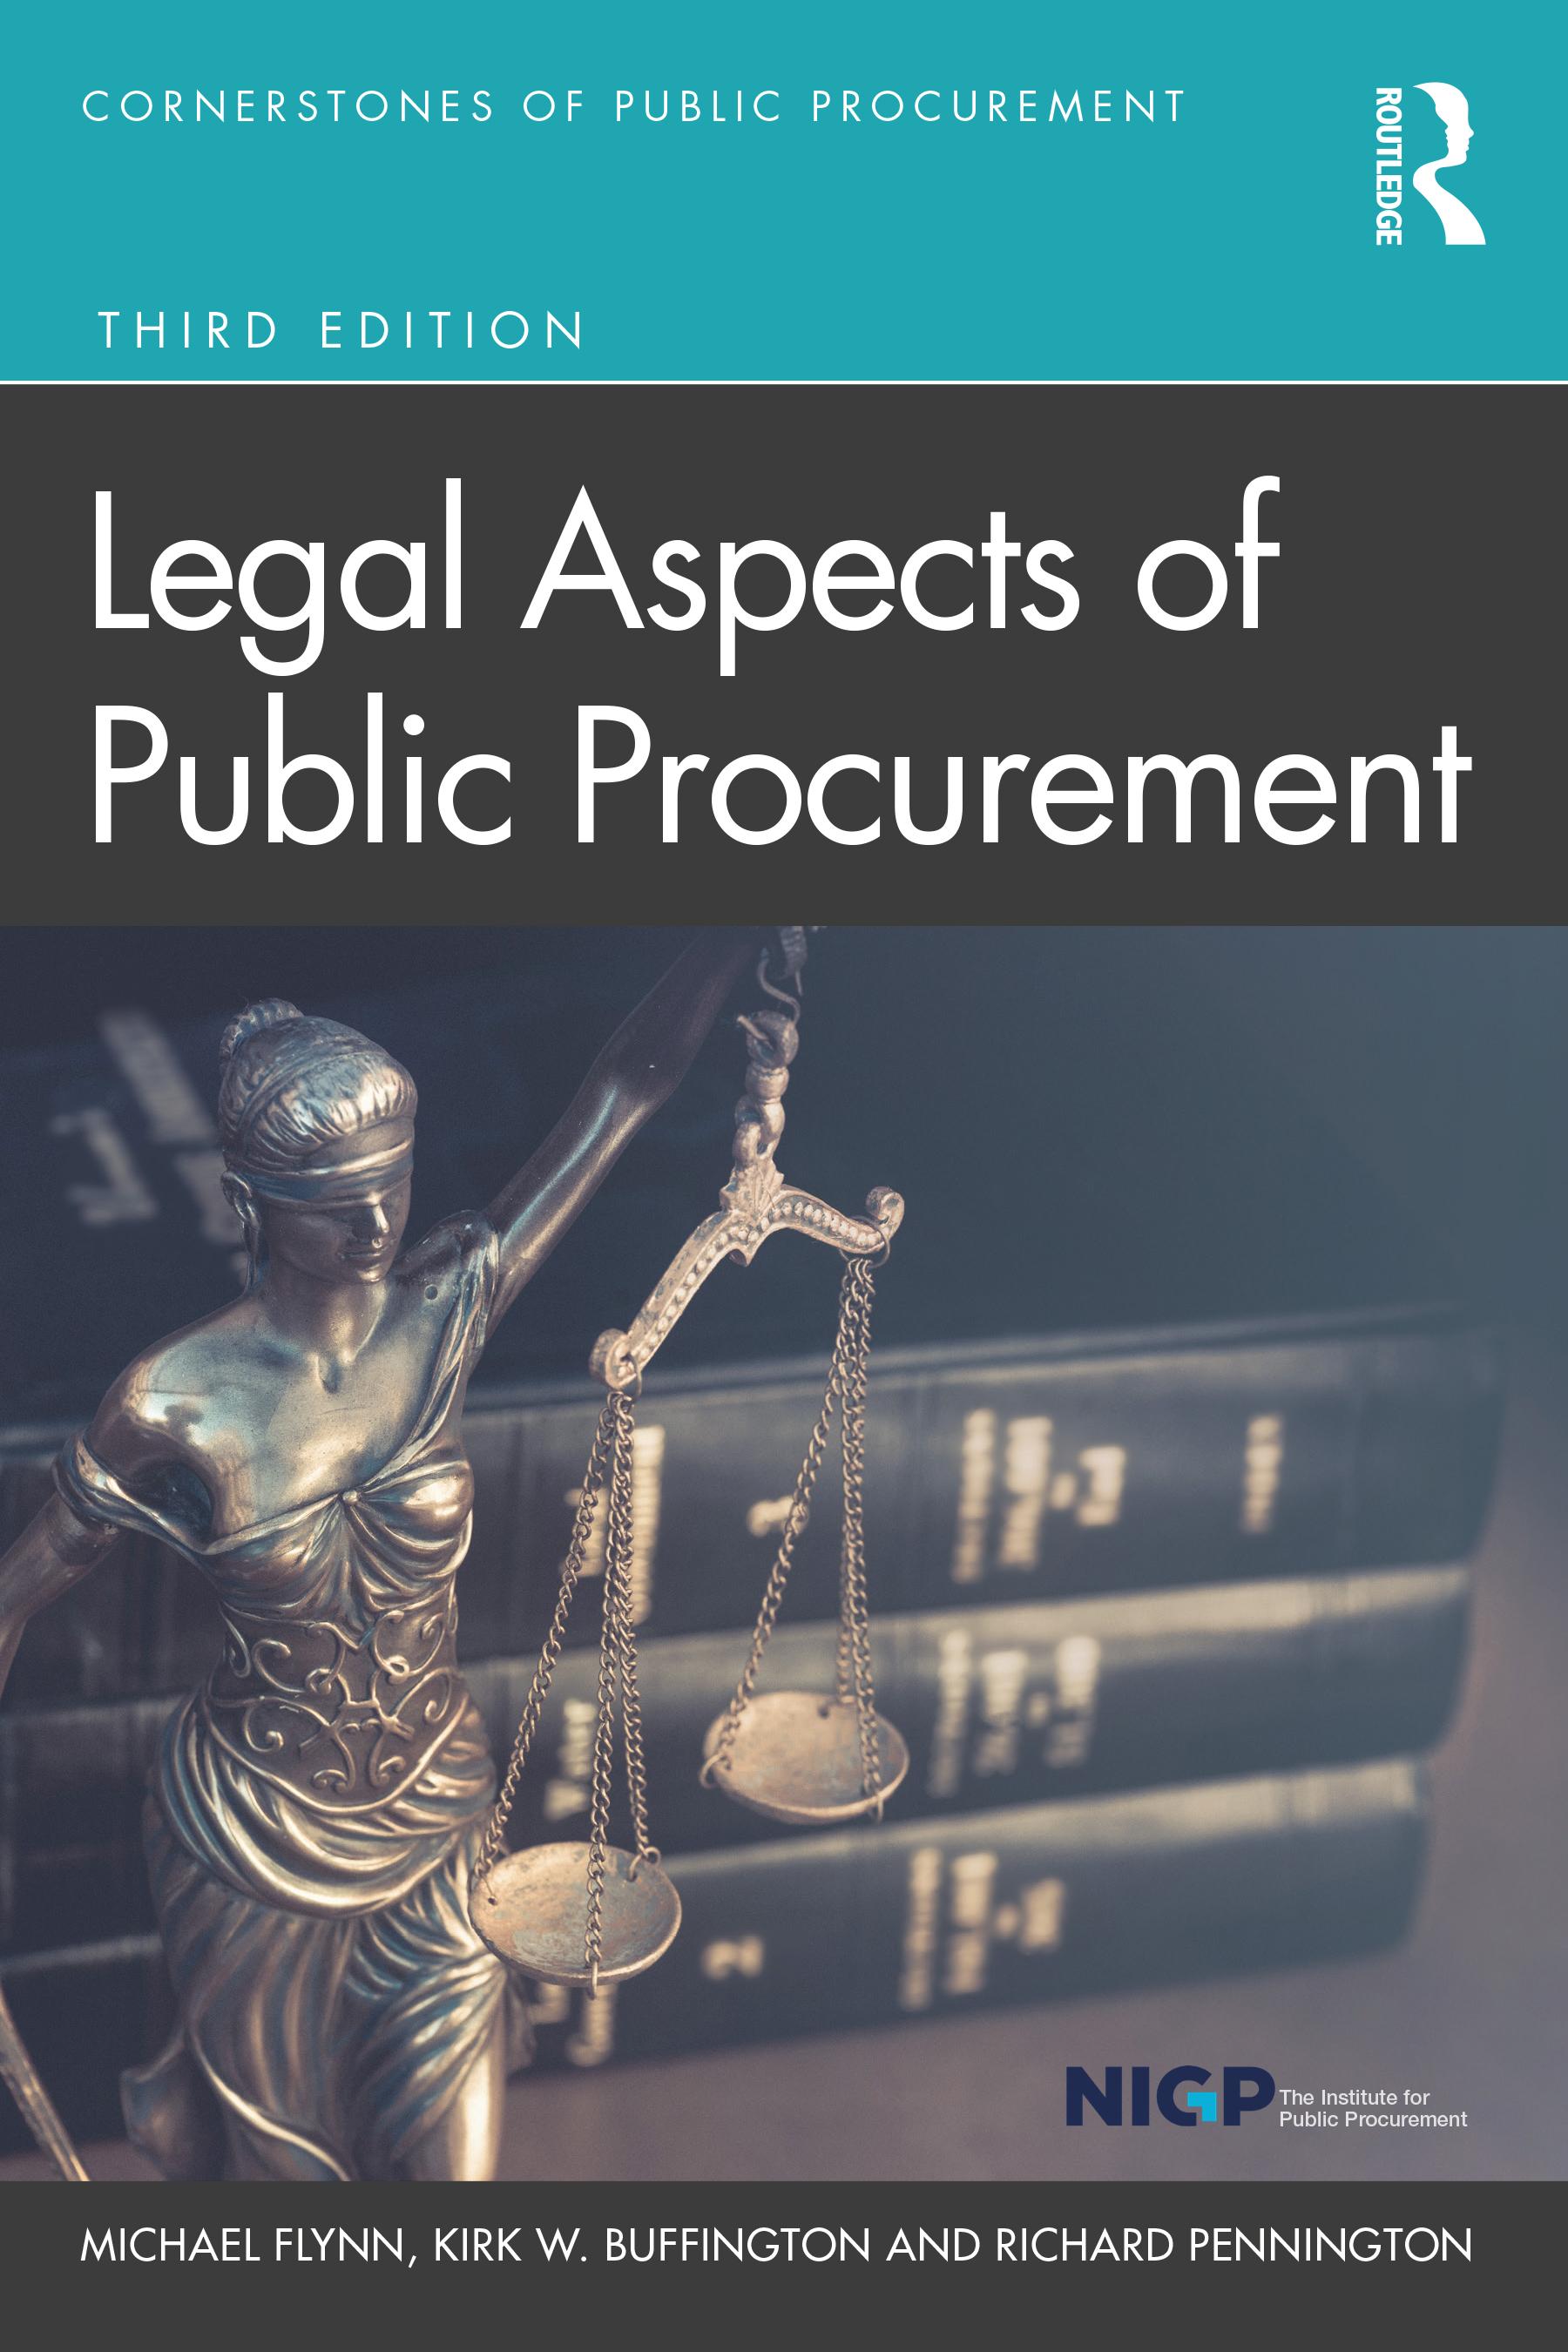 Legal Aspects of Public Procurement book cover